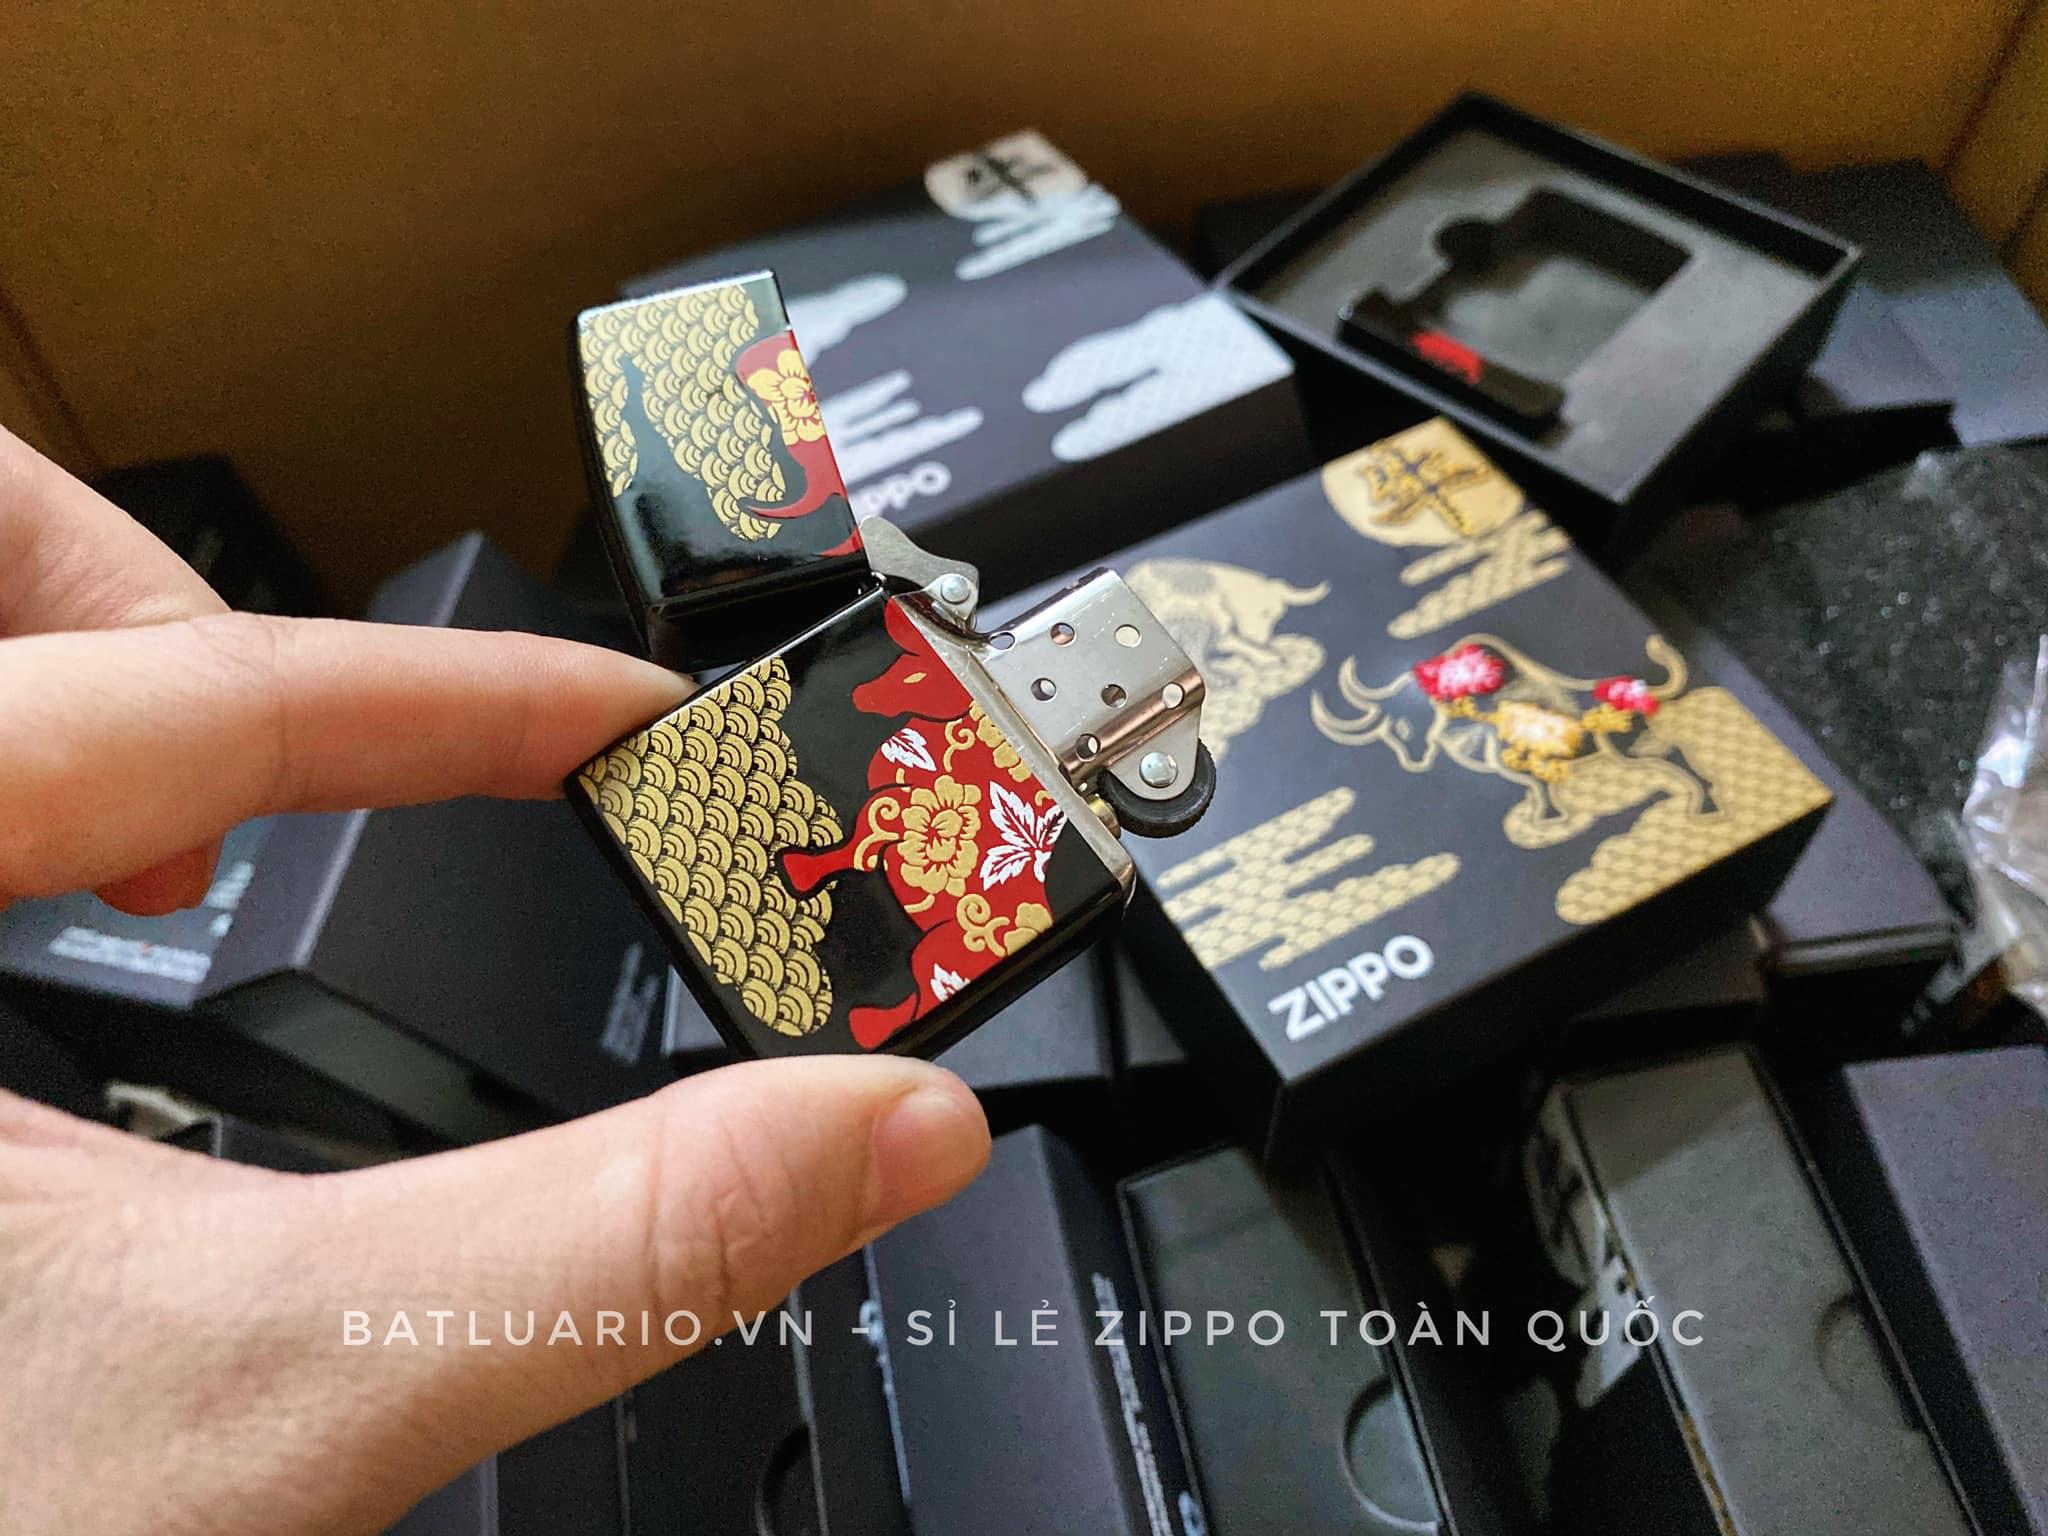 Zippo Year Of The Ox Black Asia Limited Edition - Zippo CZA-2-18B 13